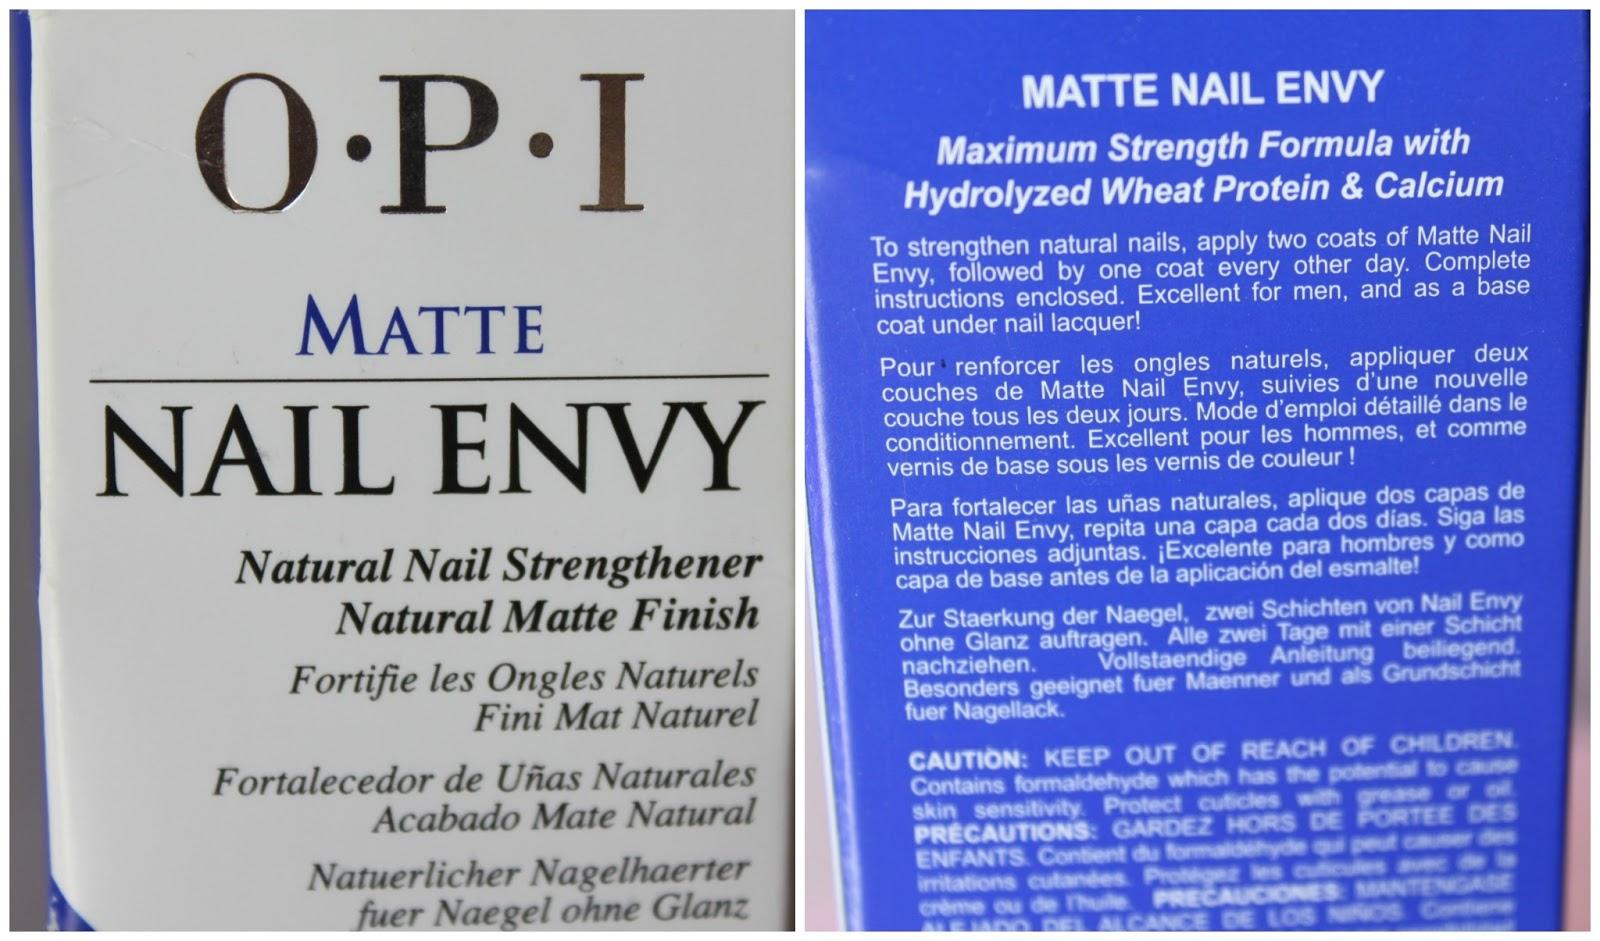 Australian Beauty Review: Nail Polish of the week: OPI Matte Nail Envy